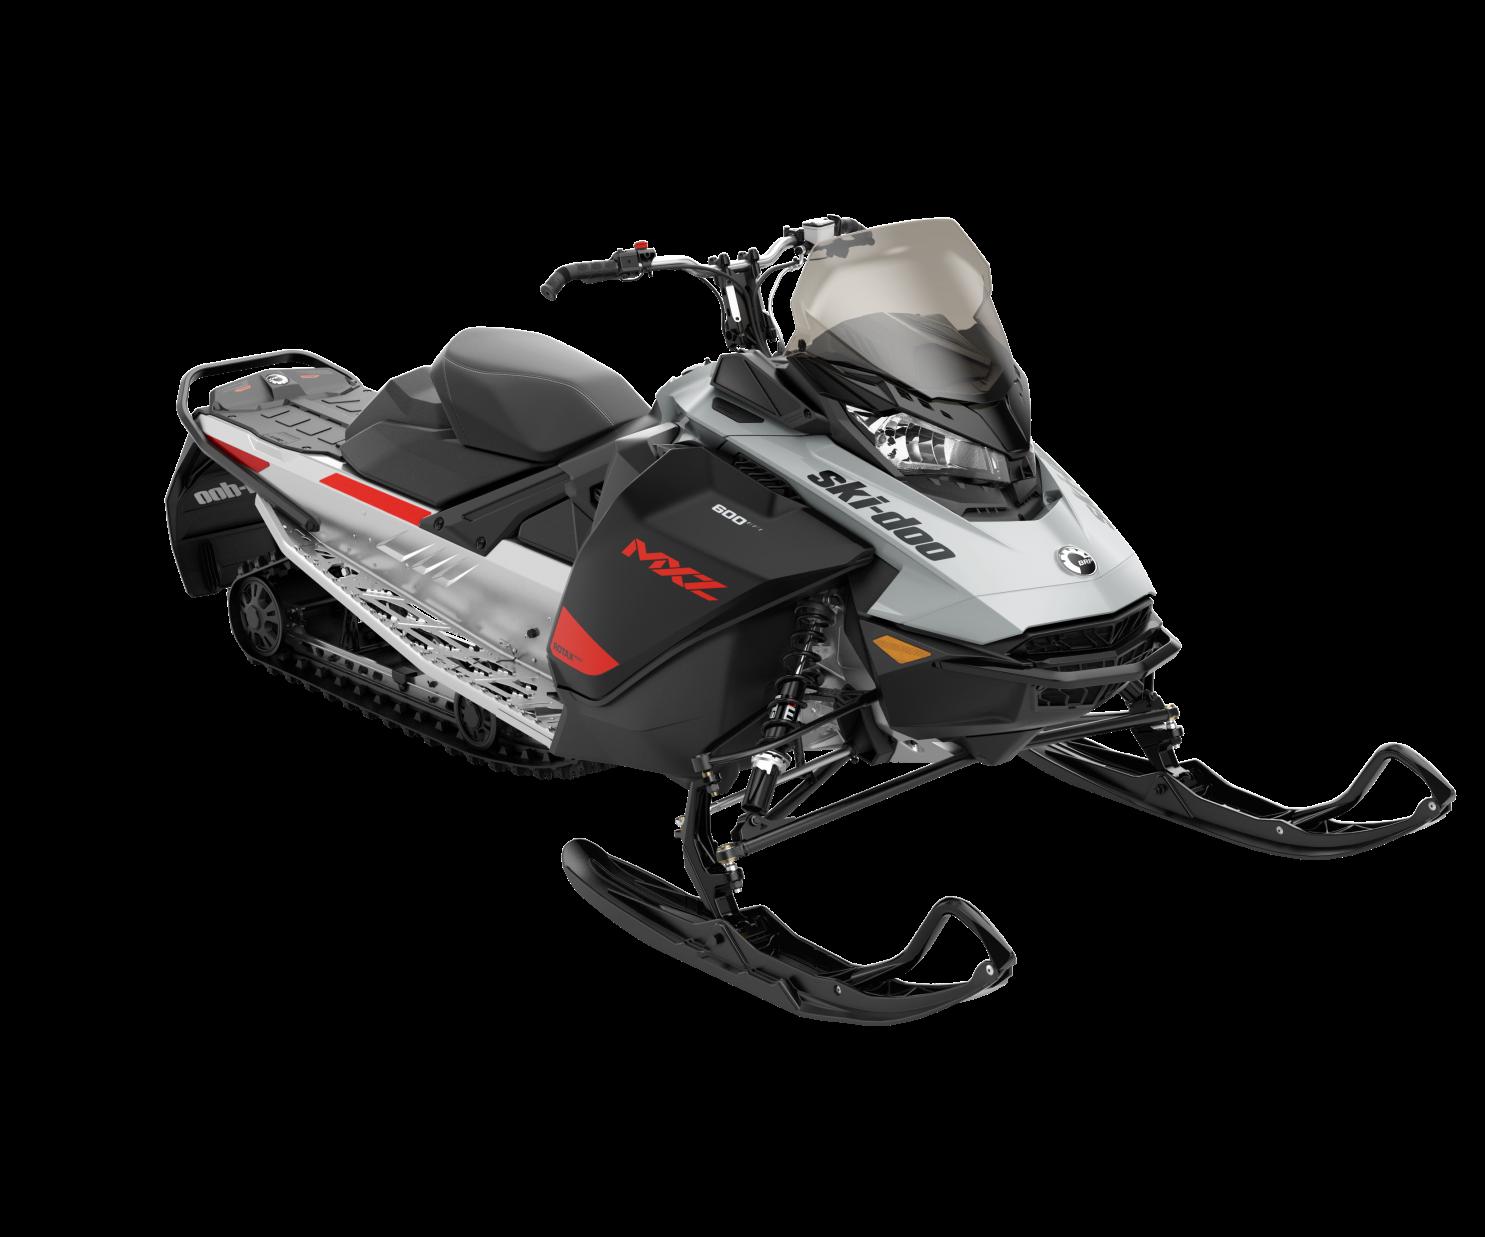 Ski-Doo MXZ SPORT 600 EFI ES